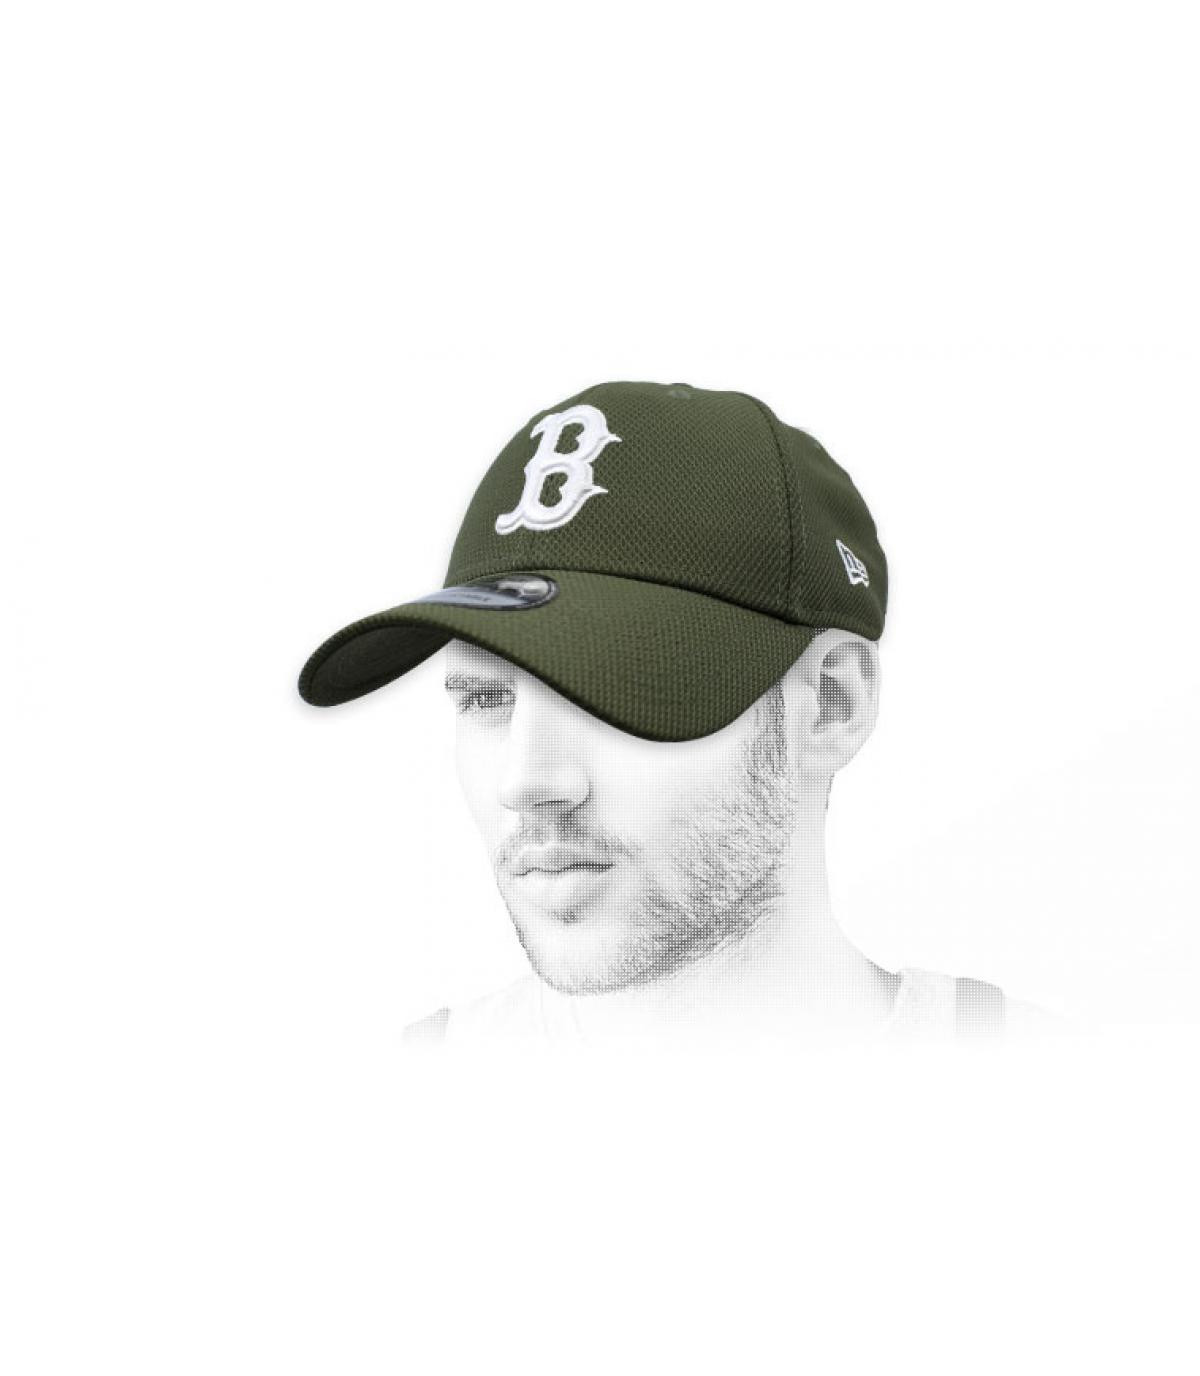 green B cap Diamond